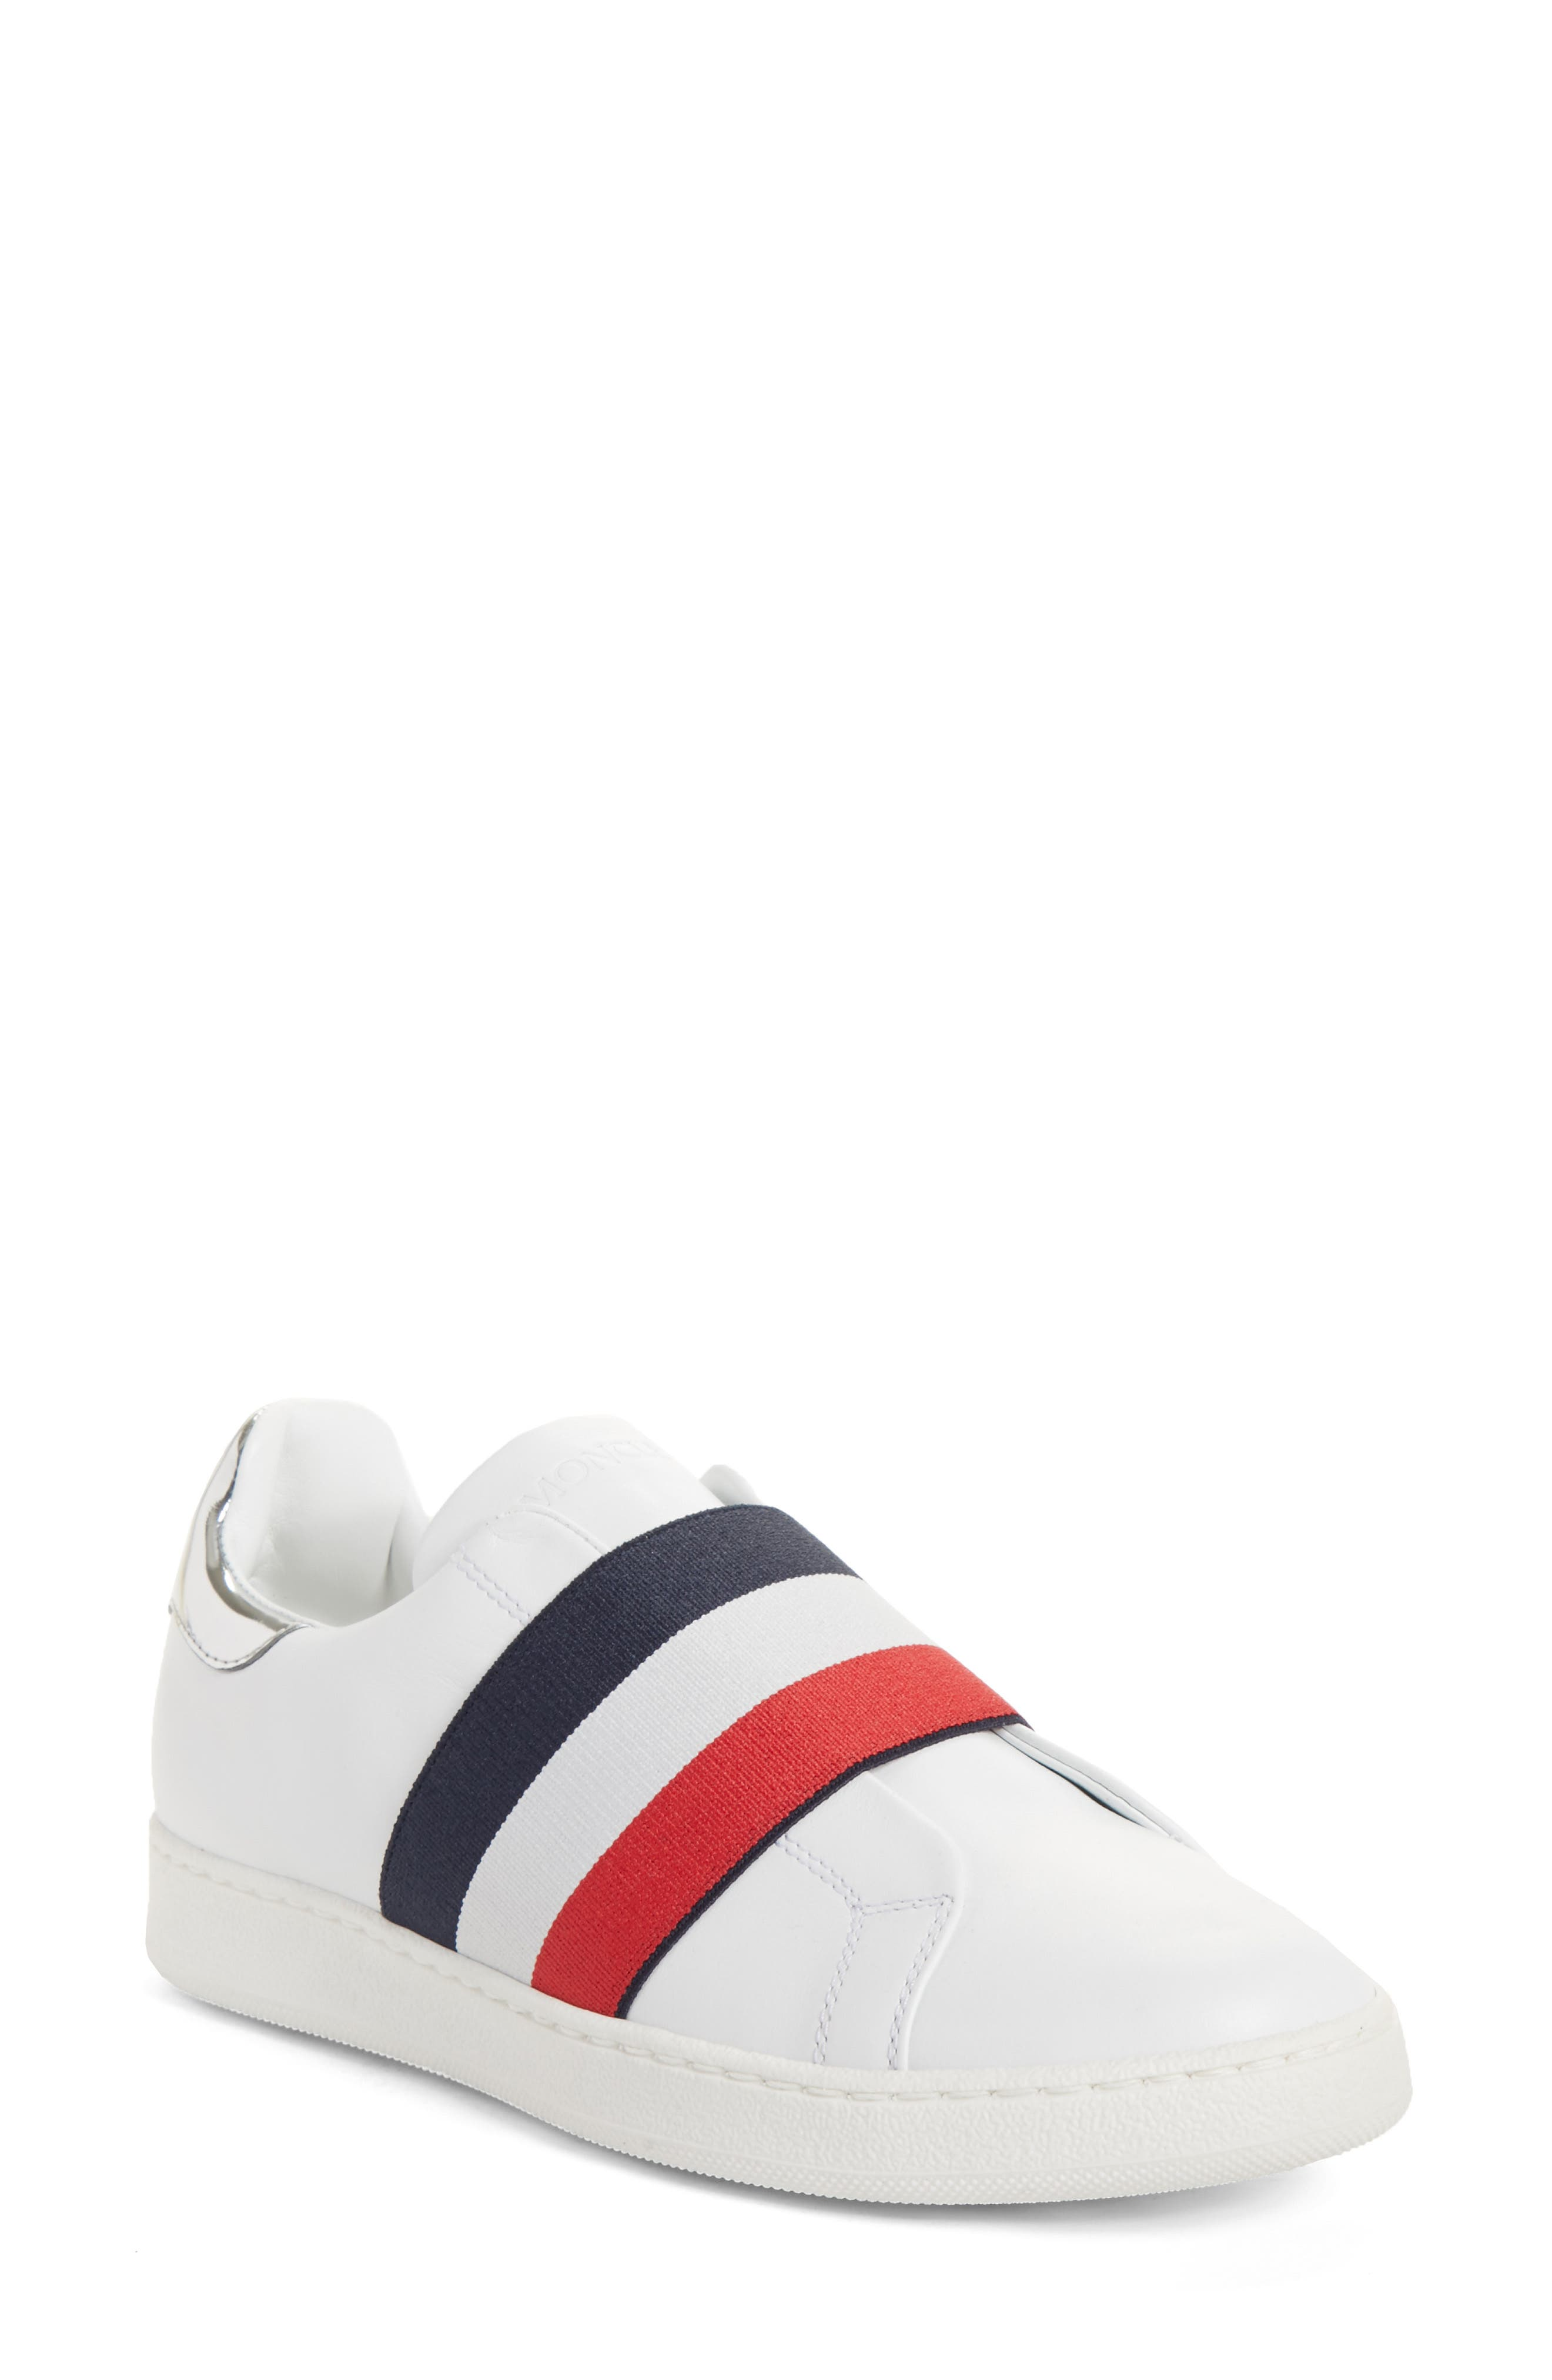 Main Image - Moncler Alizee Low Top Sneaker (Women)